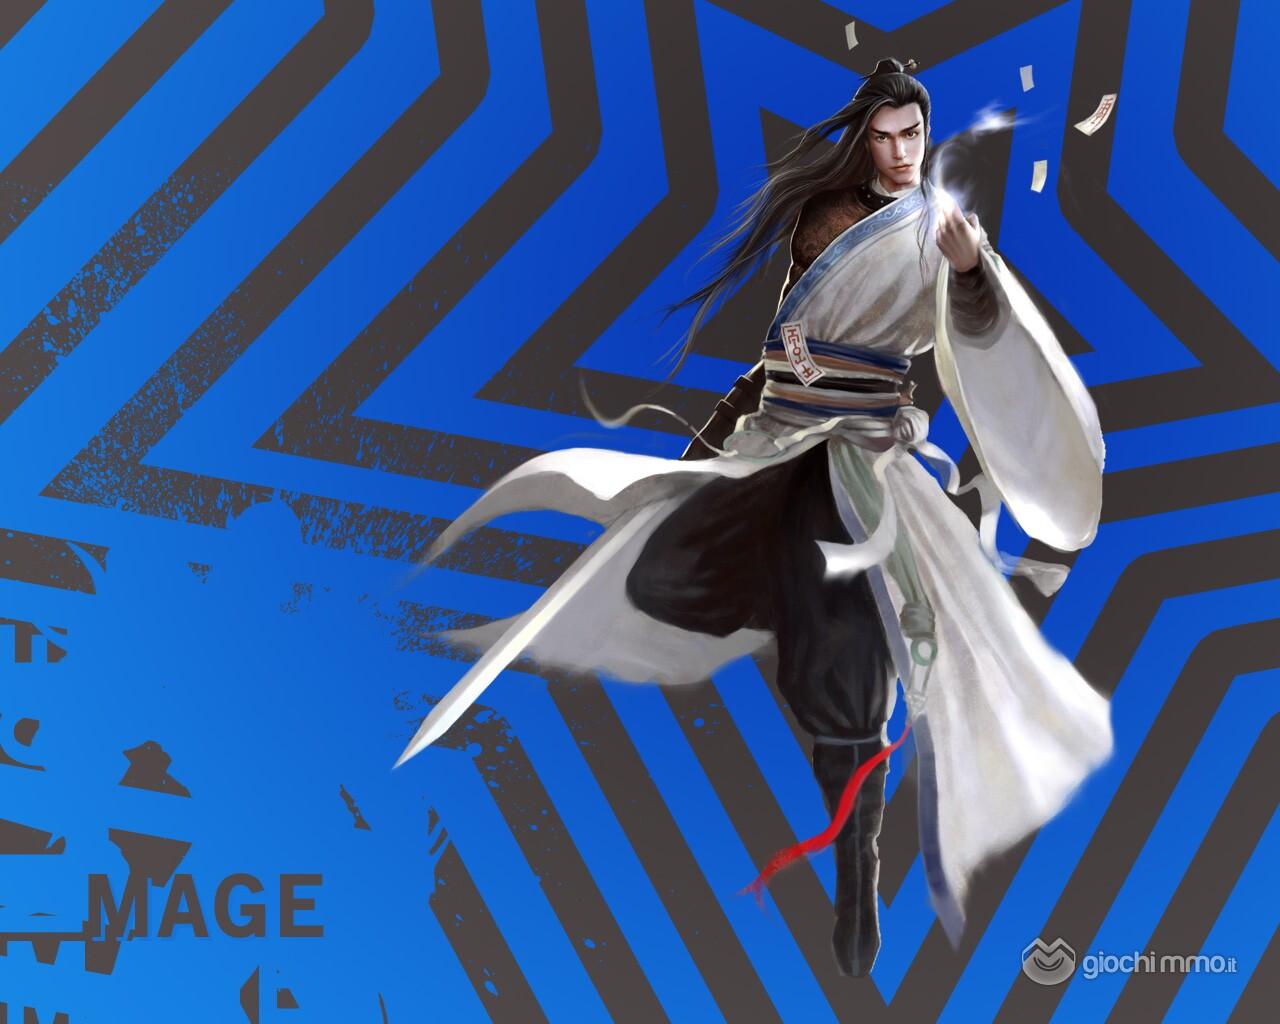 Clicca sull'immagine per ingrandirlaNome:   Dragon Soul screen1.jpgVisite: 162Dimensione:   200.9 KBID: 8470